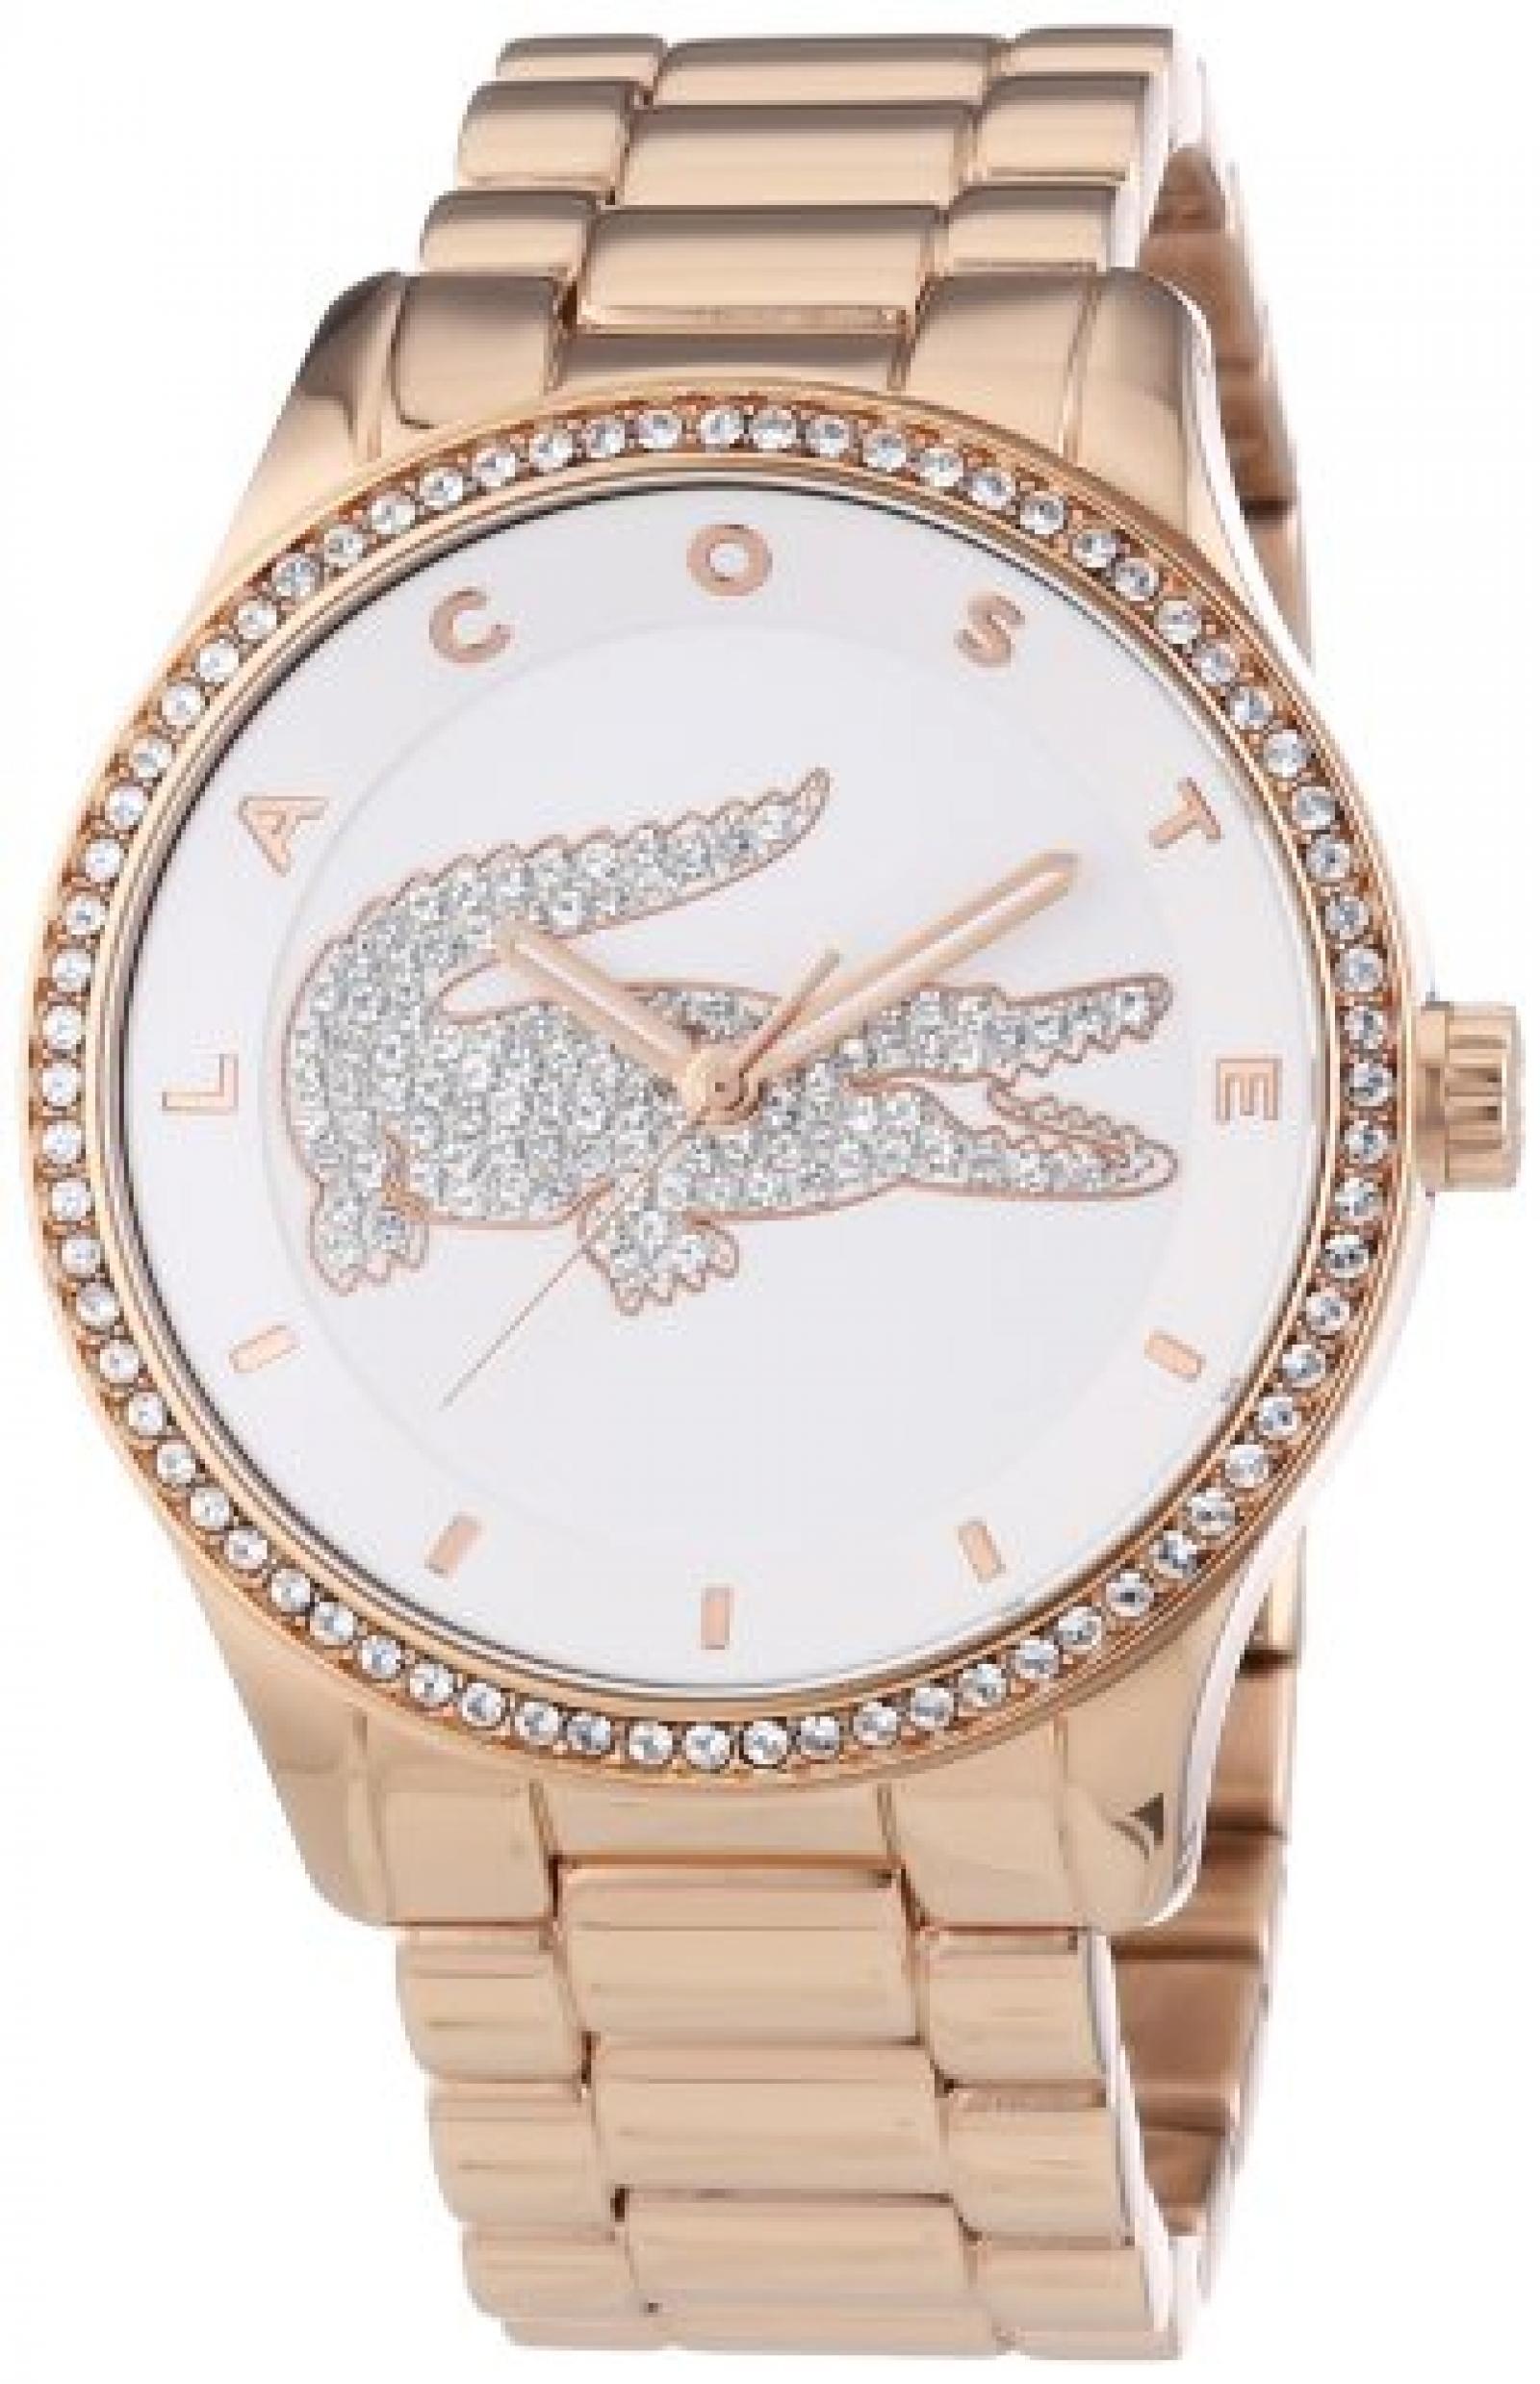 Lacoste Damen-Armbanduhr Analog Quarz Edelstahl beschichtet 2000828